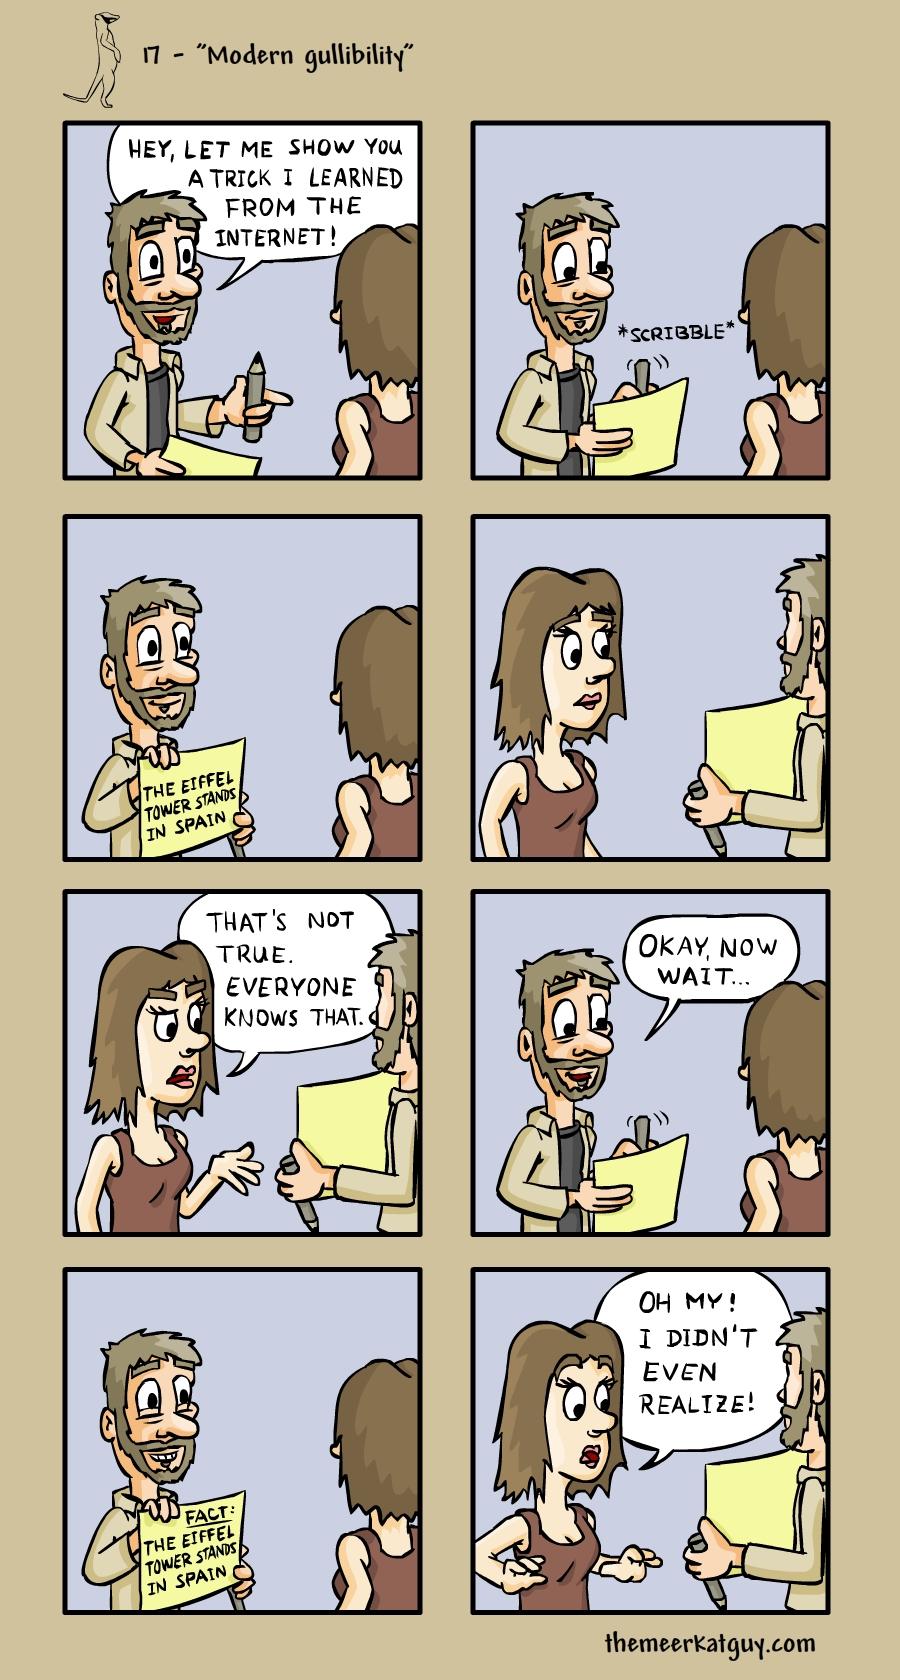 Modern gullibility